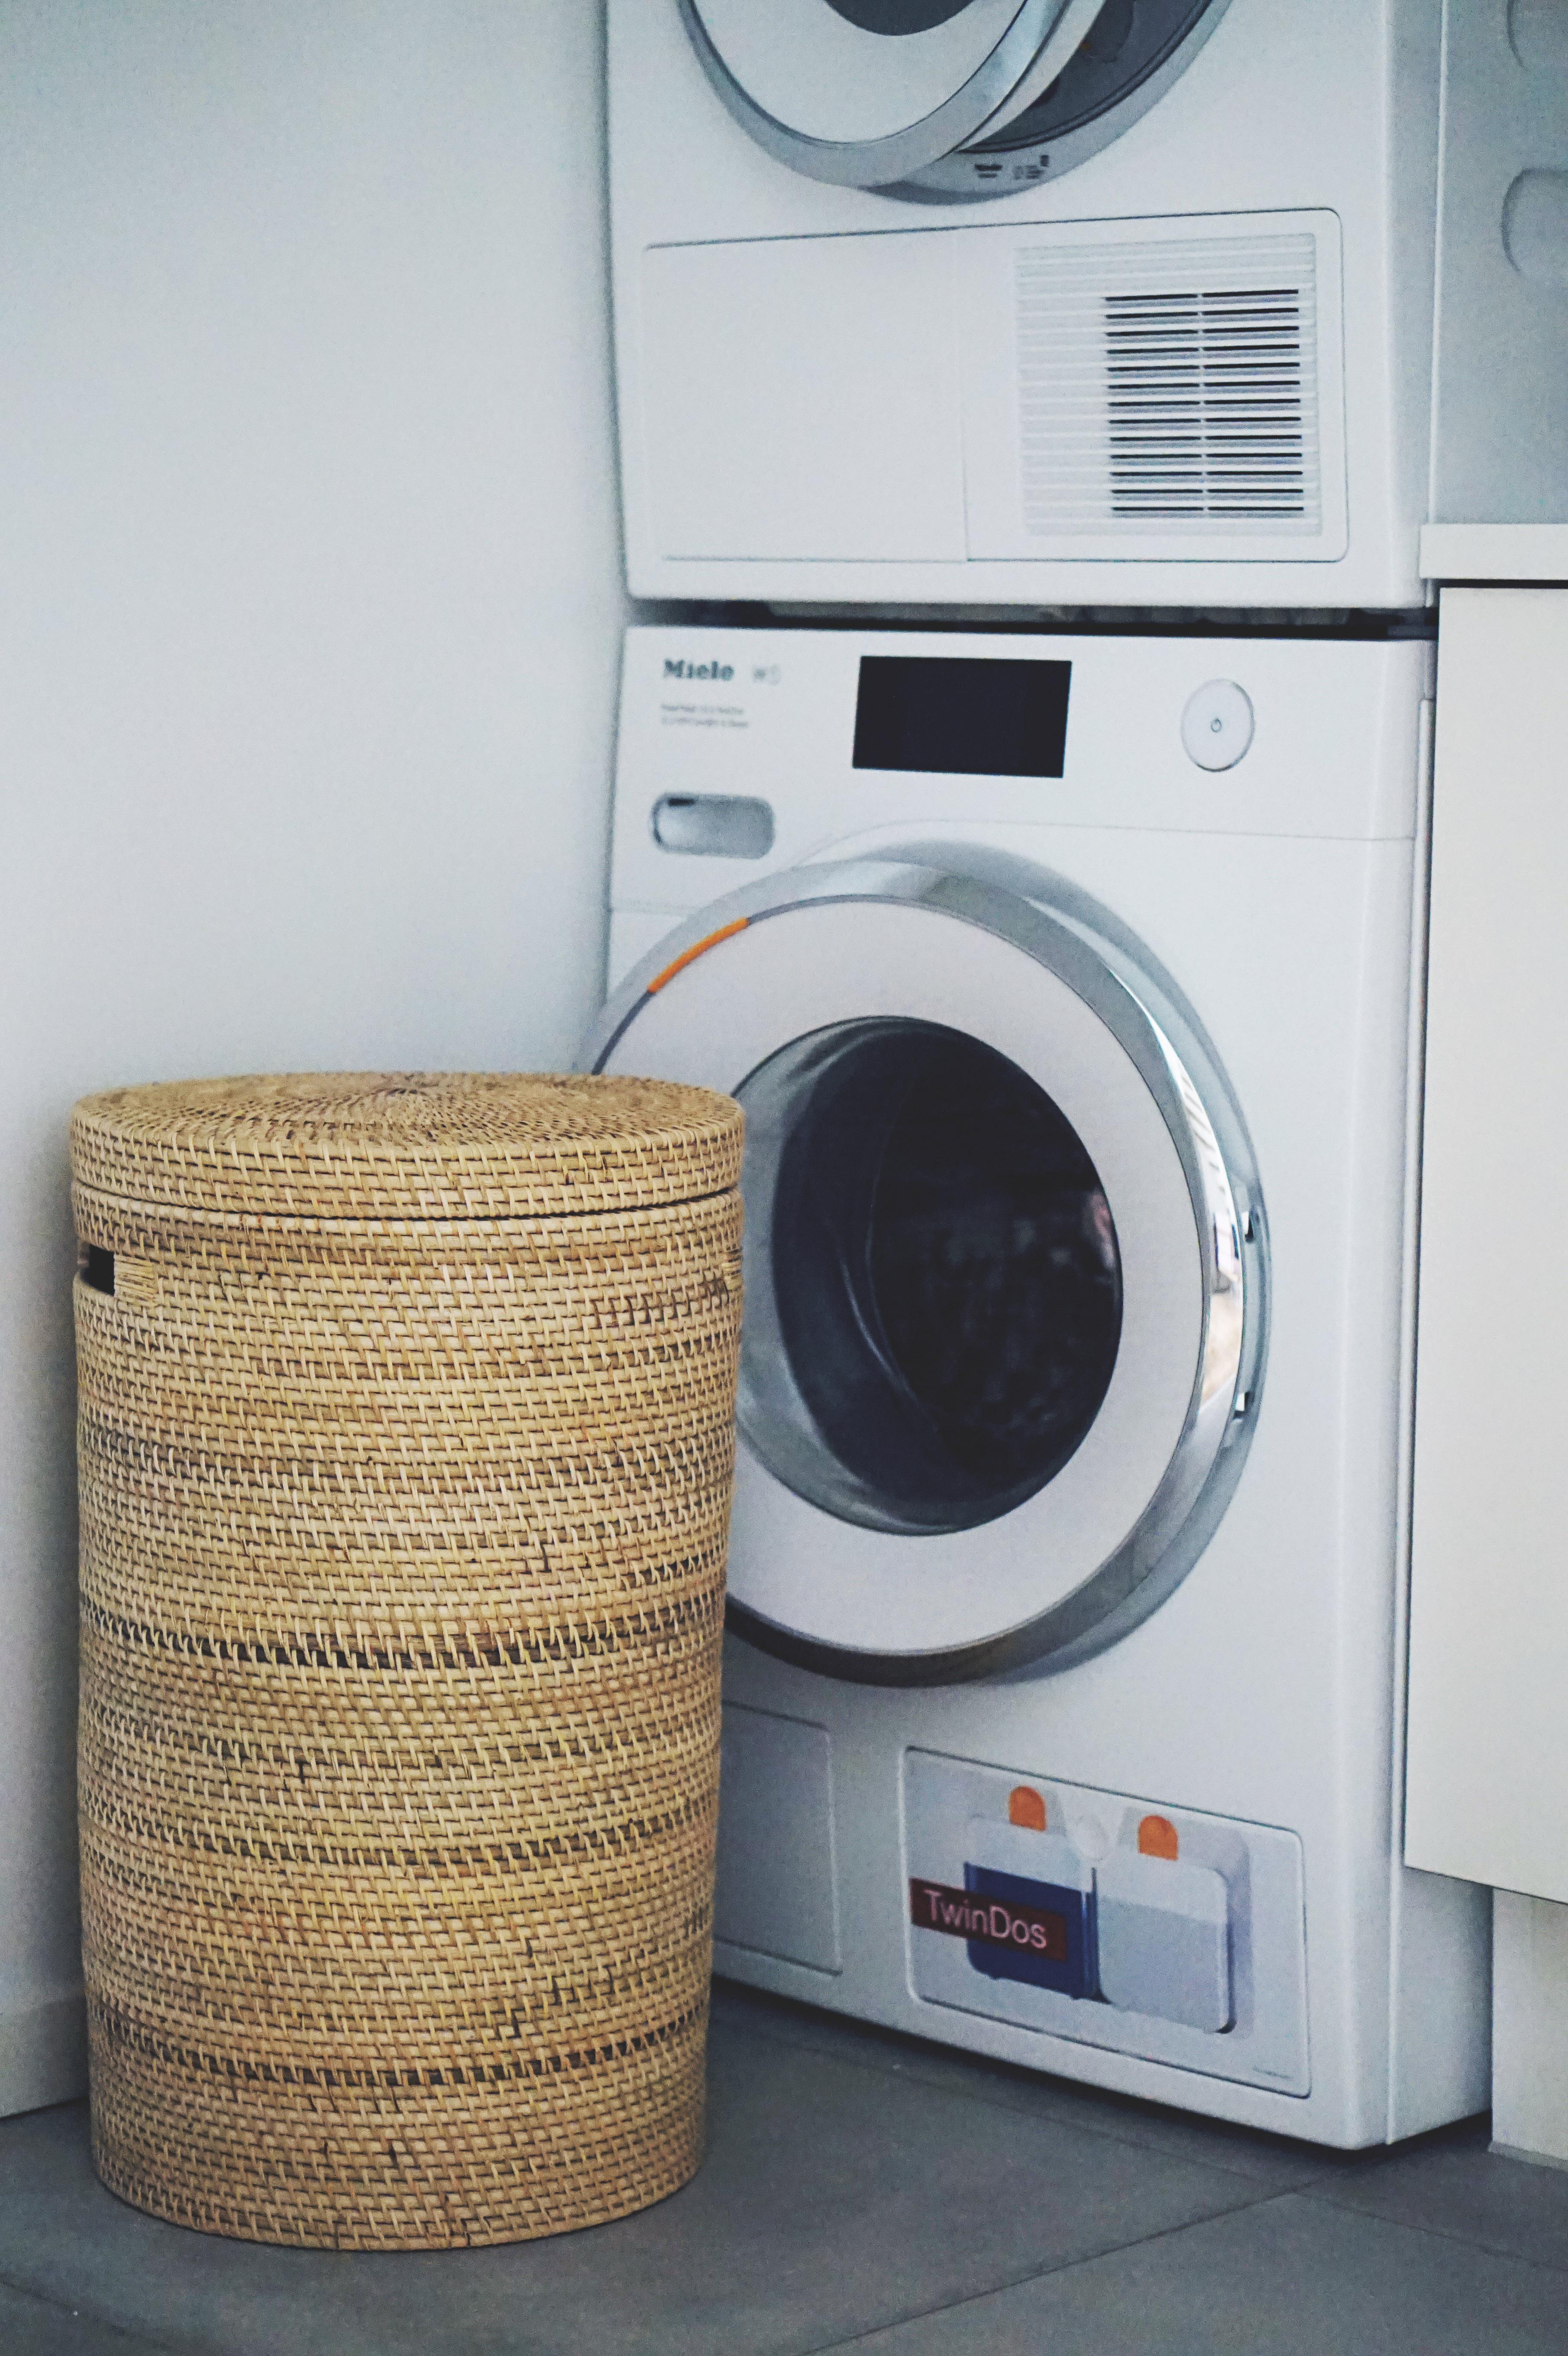 Huskøb: Livet med bryggers og <strong>Mieles</strong> vaskemaskine og tørretumbler 3